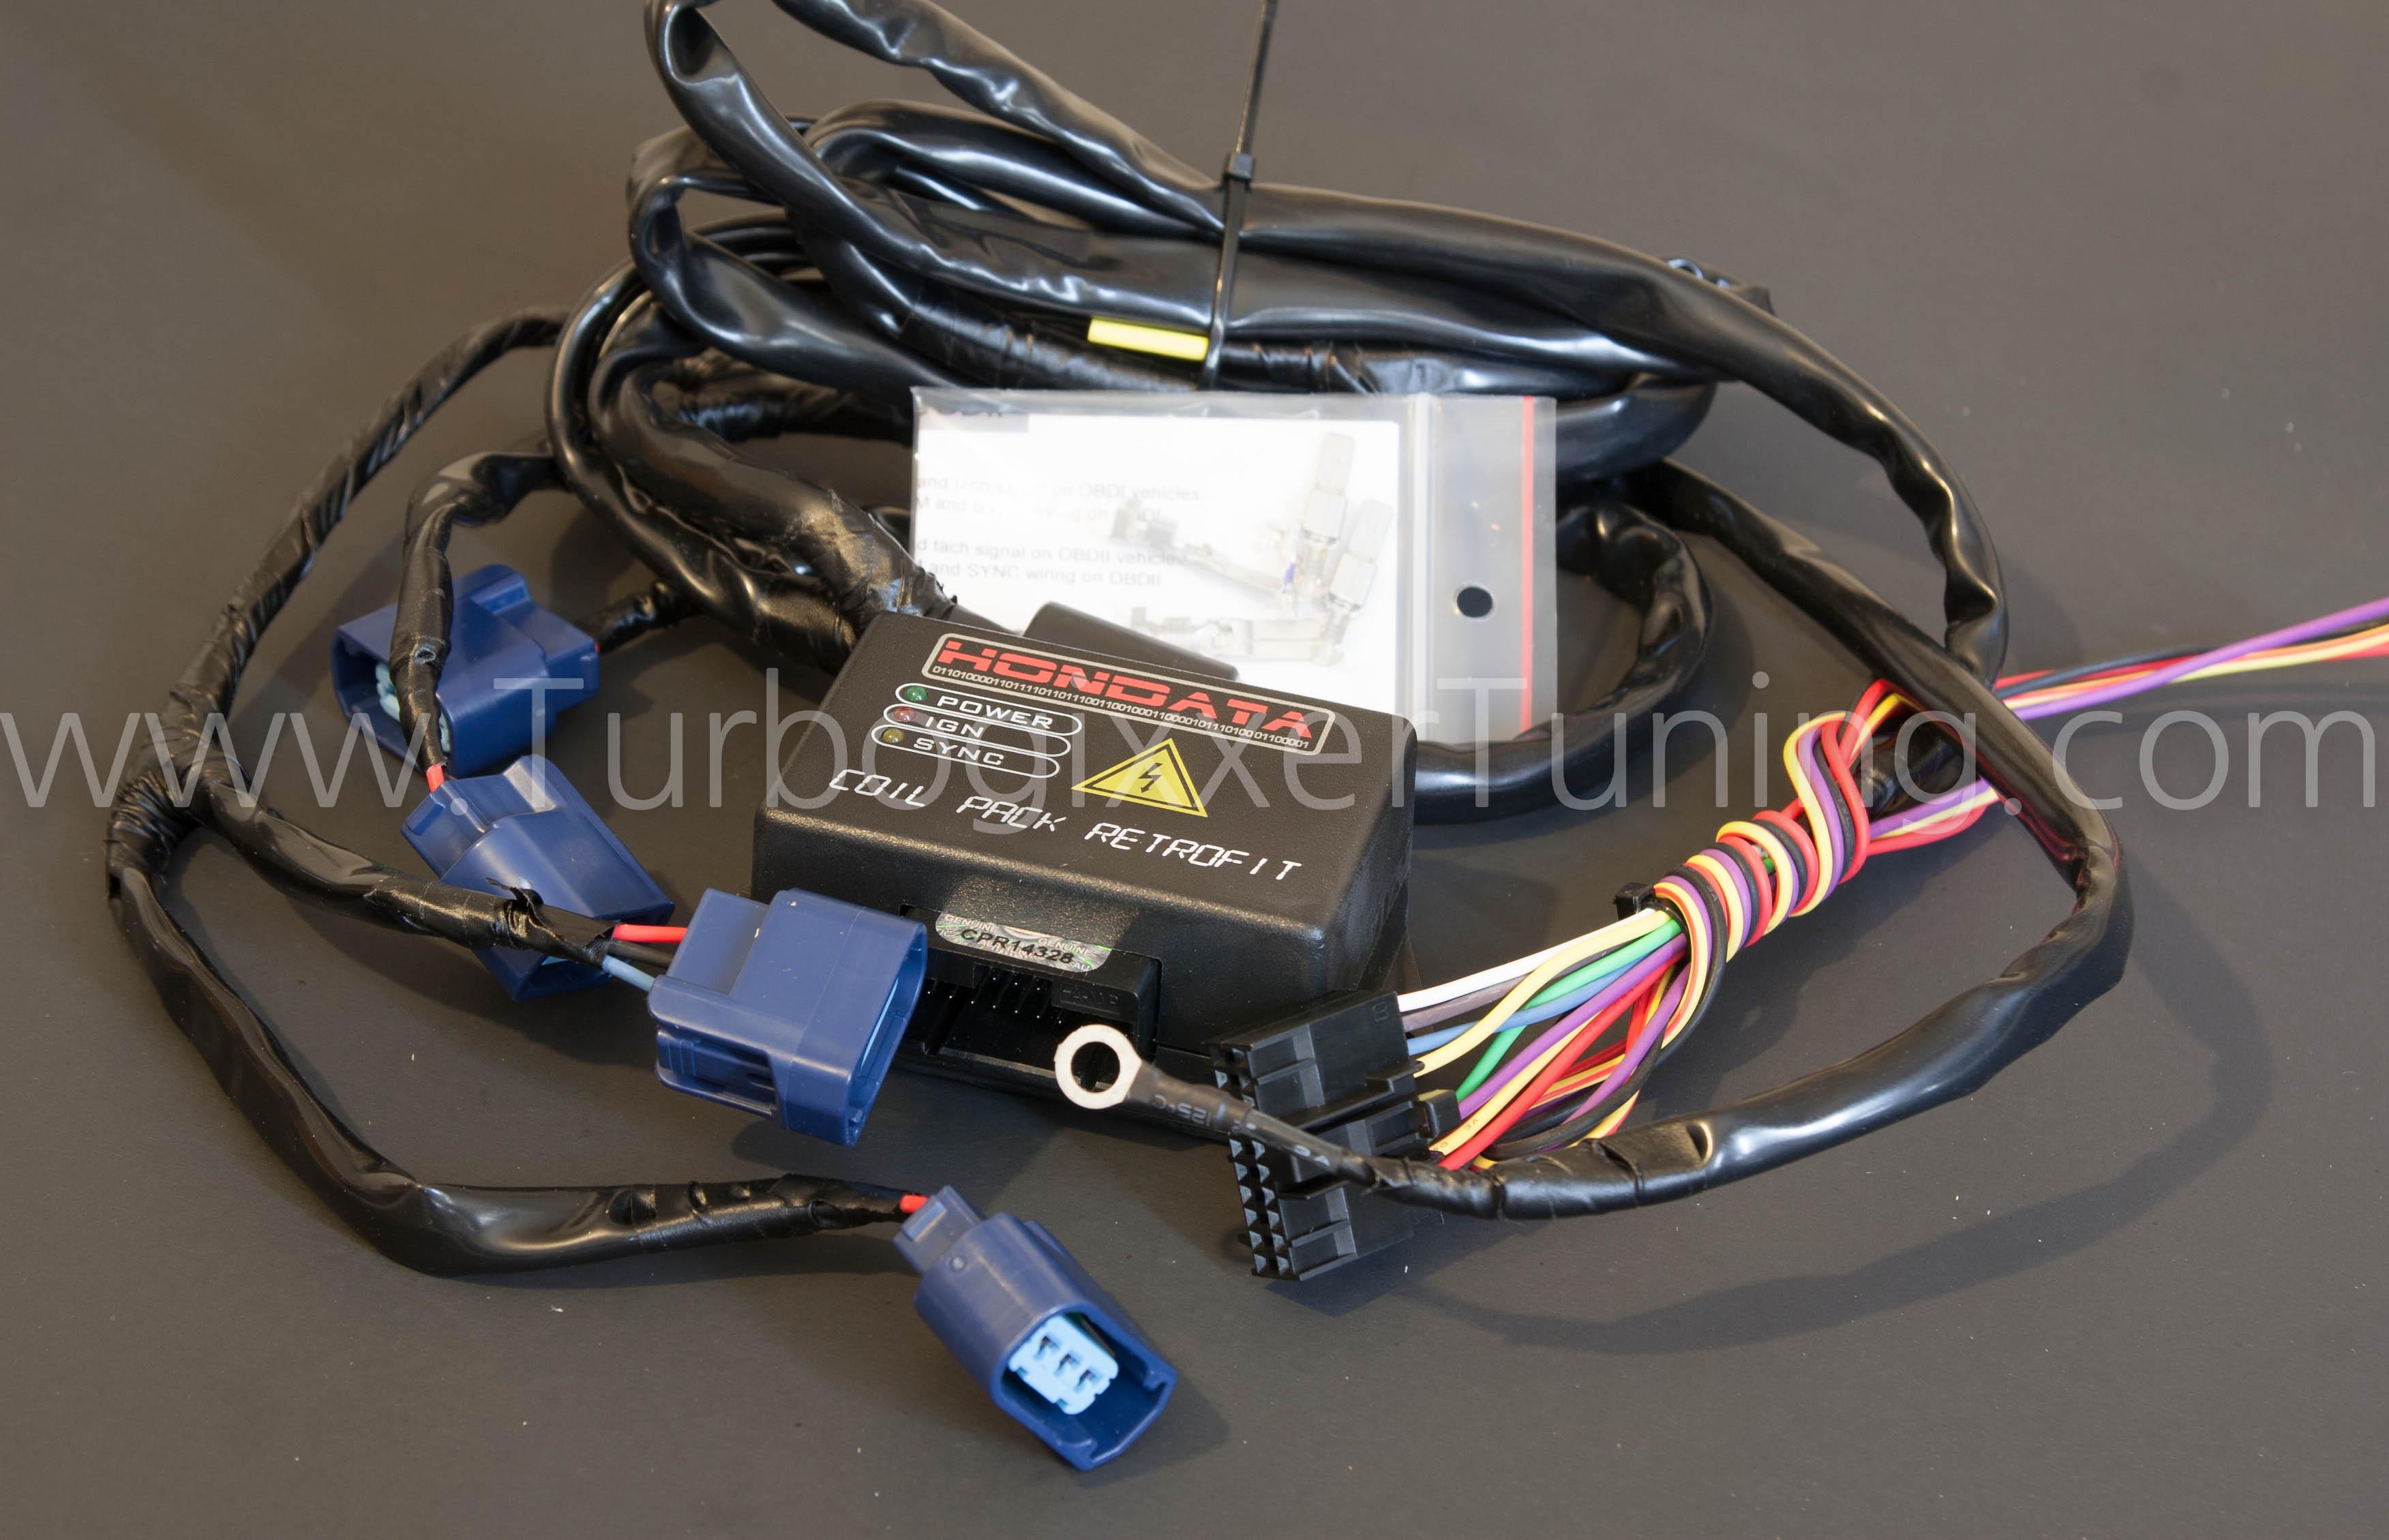 Turbogixxer Tuning    Hondata    Hondata Coil Pack